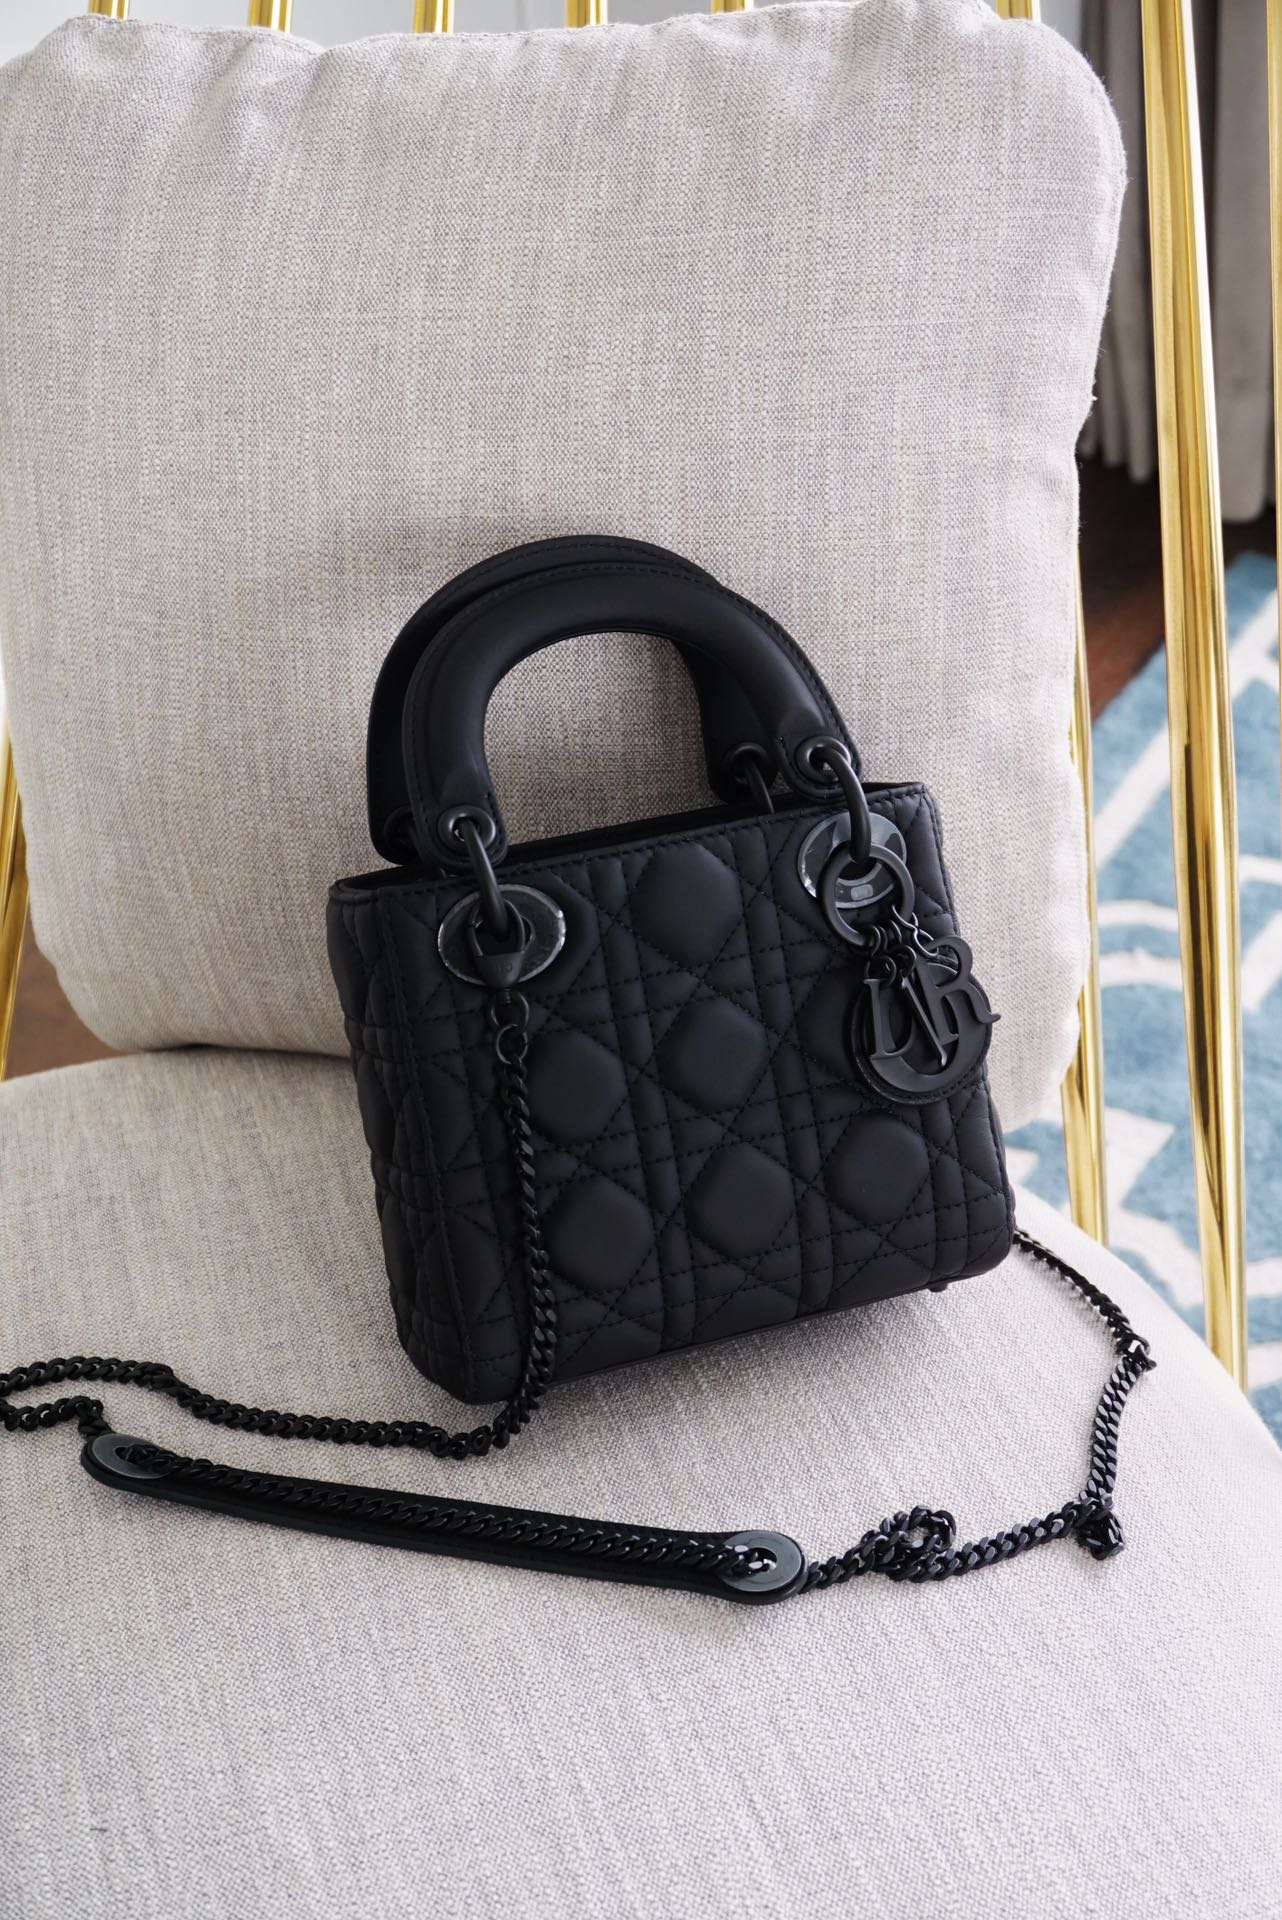 Dior 迪奥 戴妃包 Lady Dior 三格/17cm 磨砂黑   直击心脏 与众不同-百搭超A